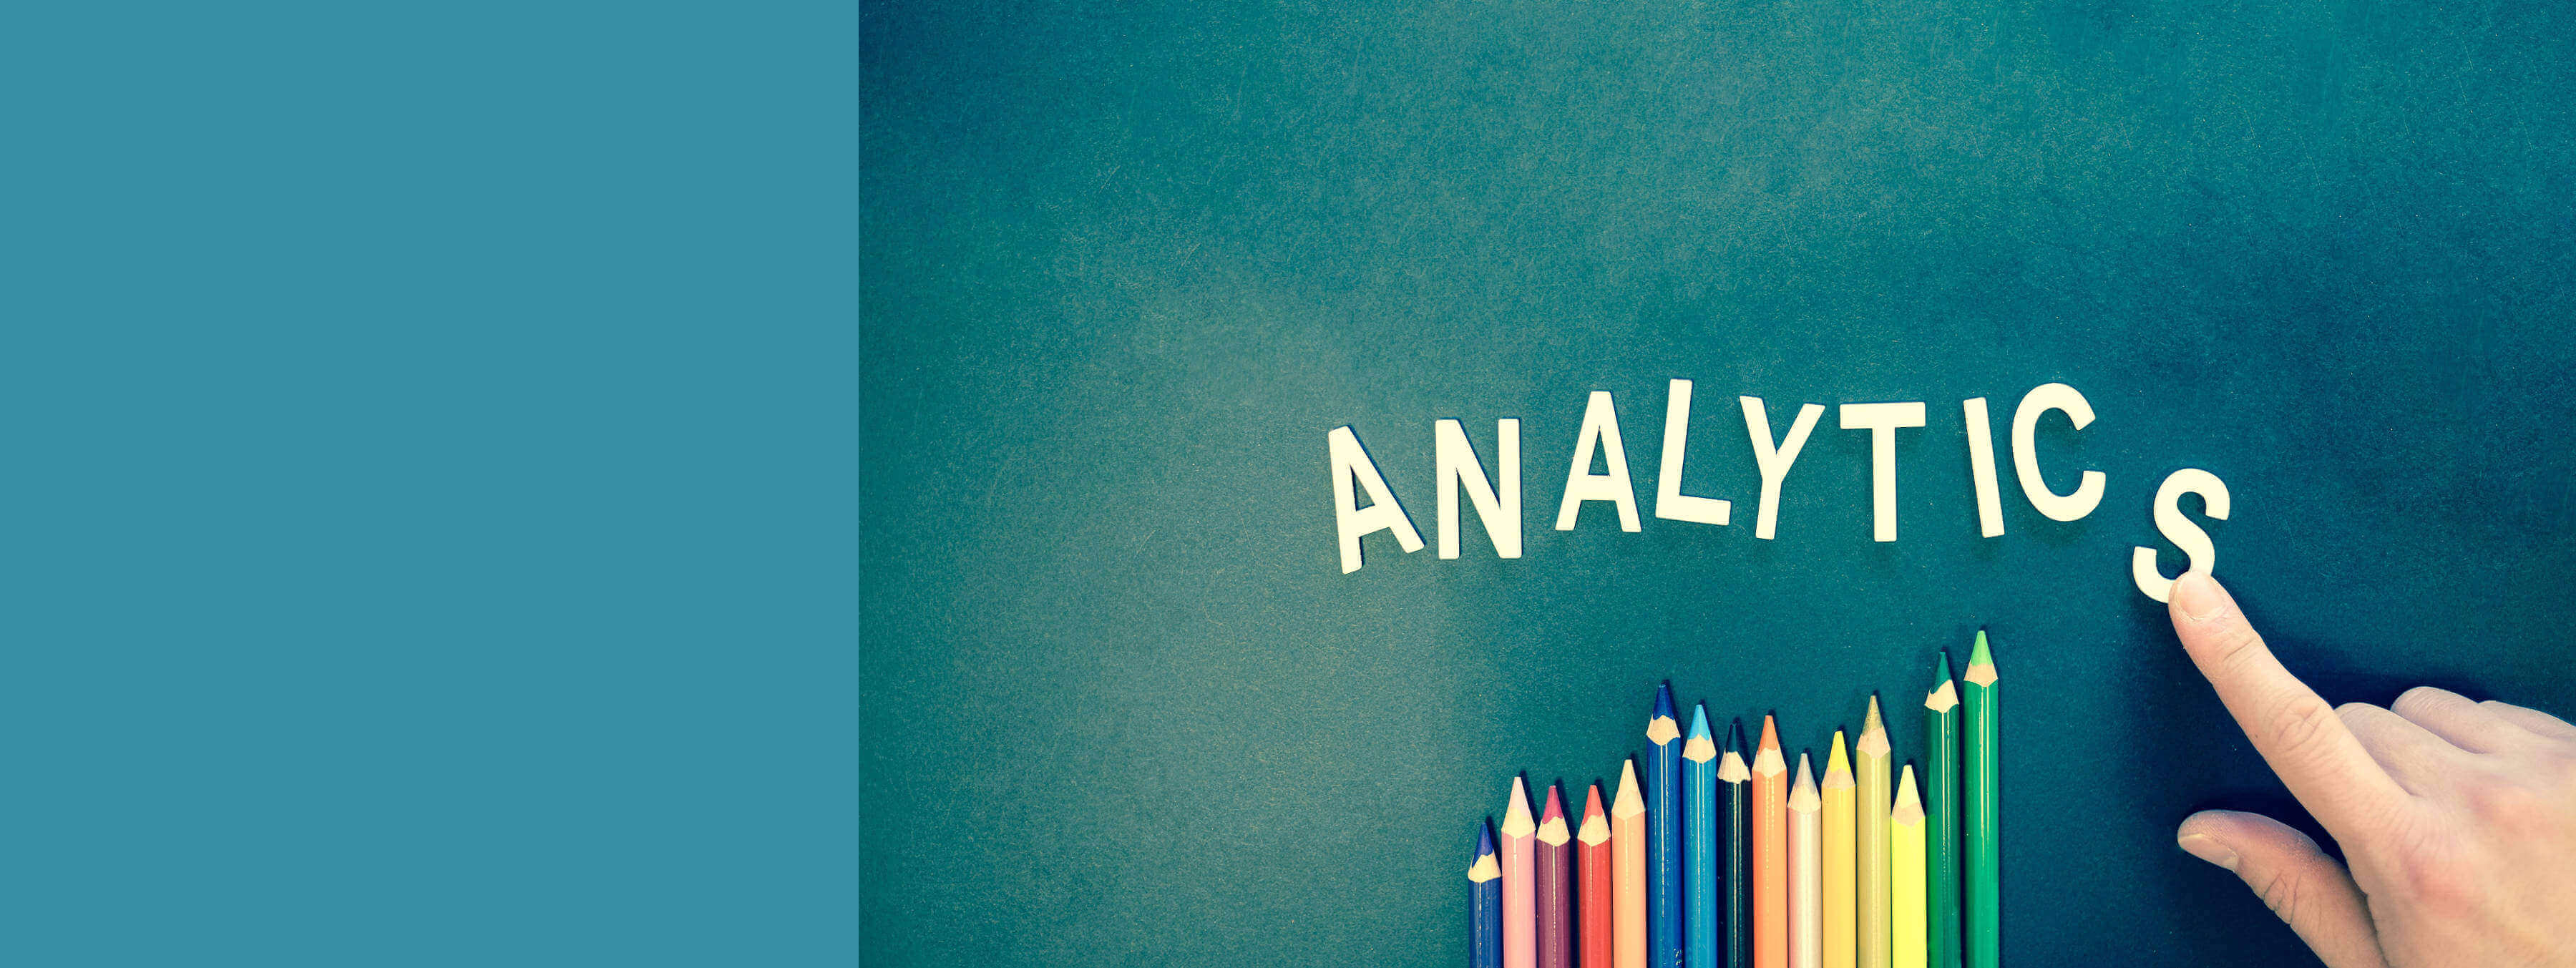 Analytics Background